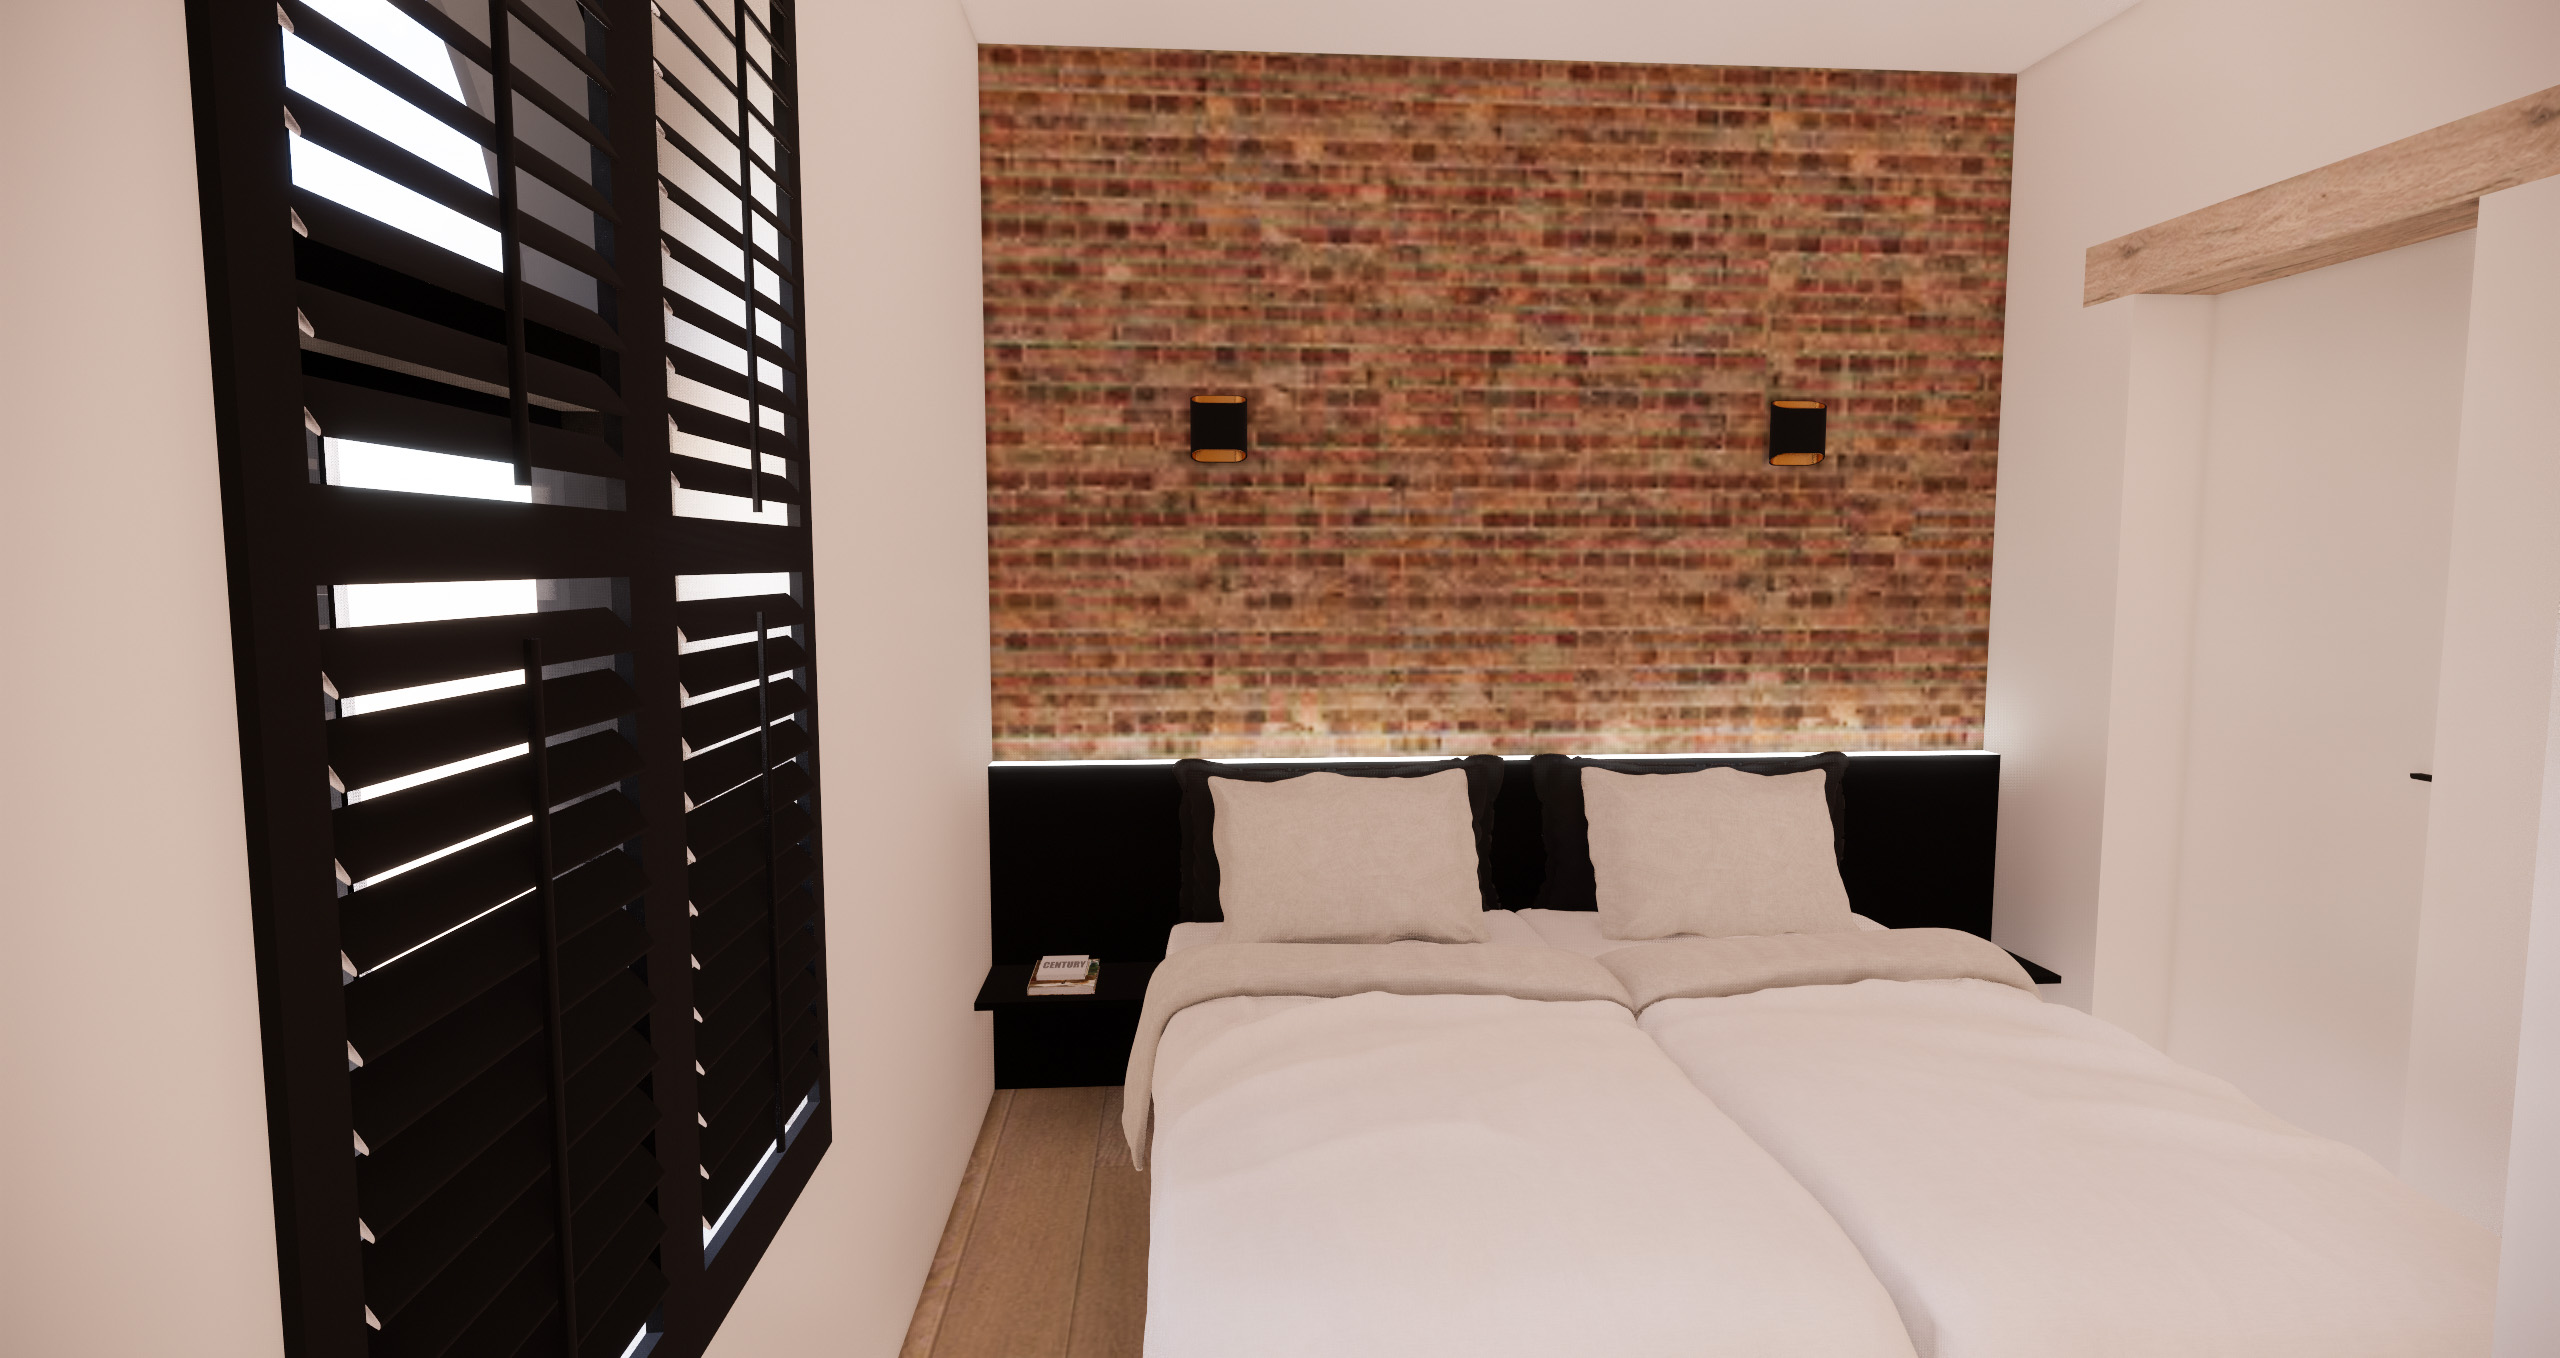 Vakantiewoning / Maison de vacances Roesbrugge 2